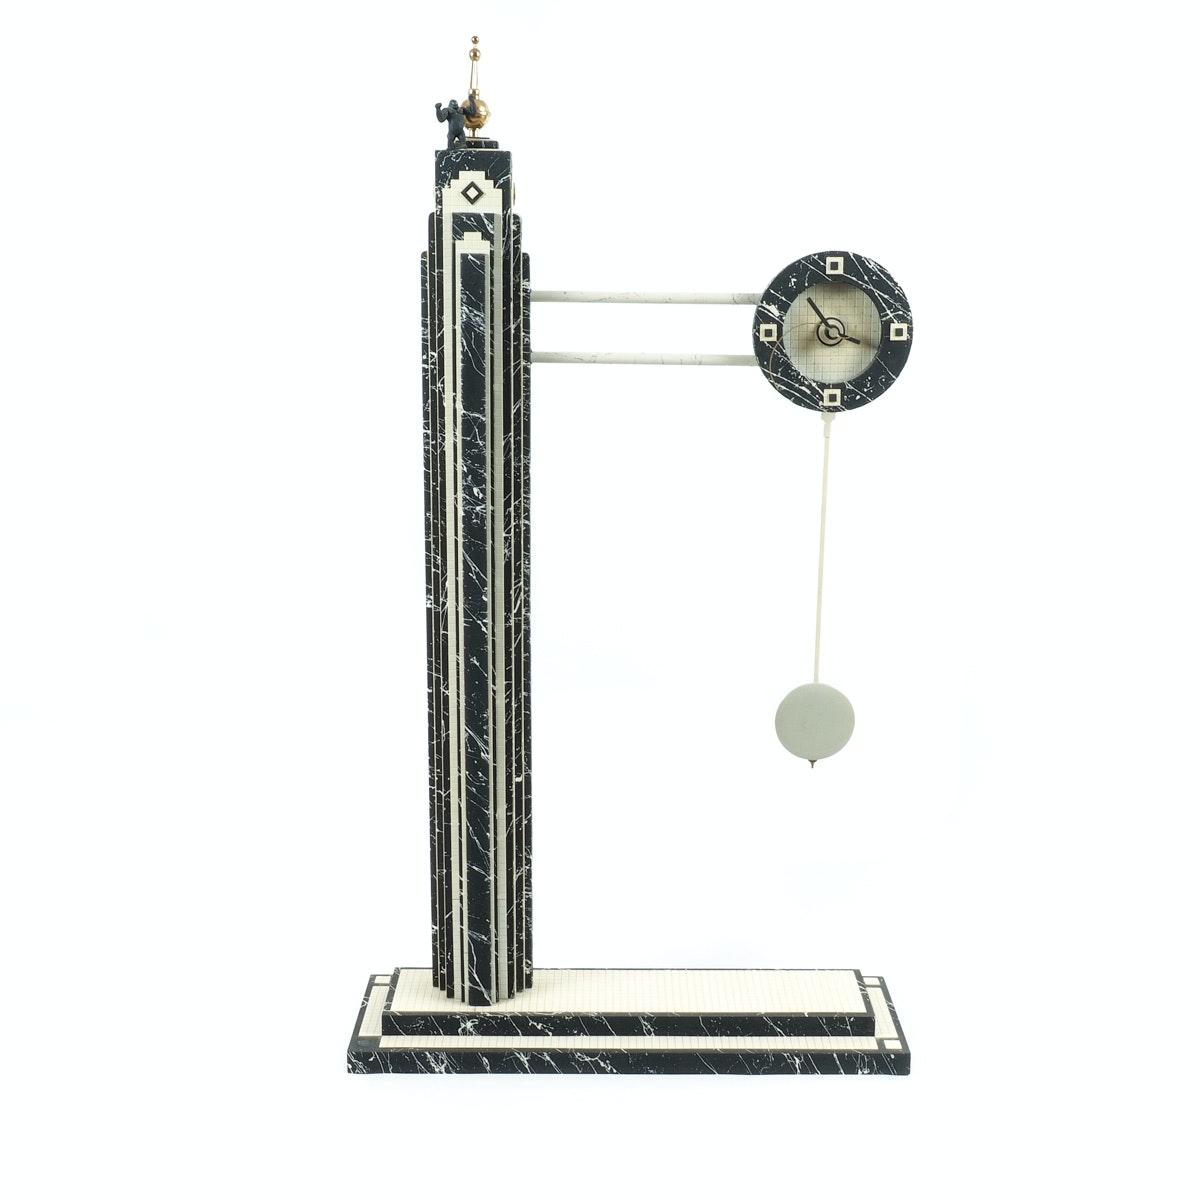 King Kong Empire State Building Clock Sculpture